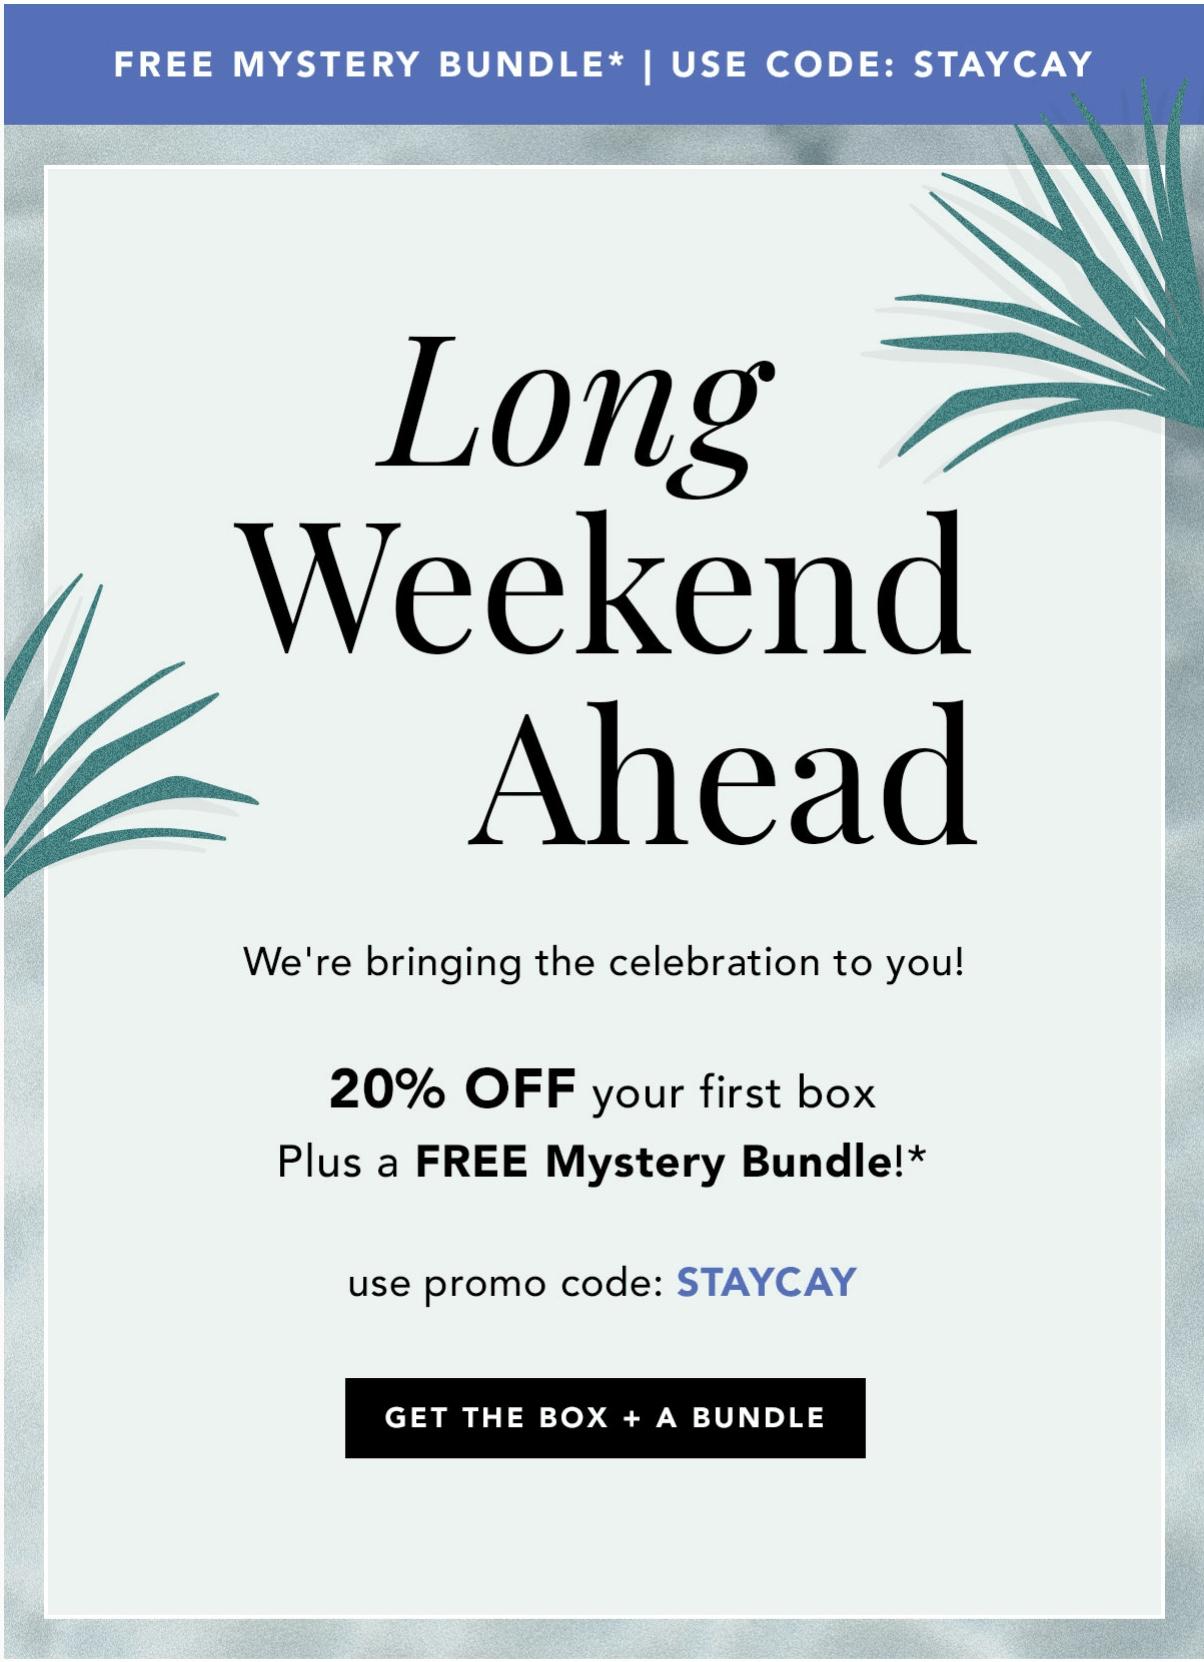 FabFitFun Memorial Day Sale – Free Mystery Bundle + 20% Off!